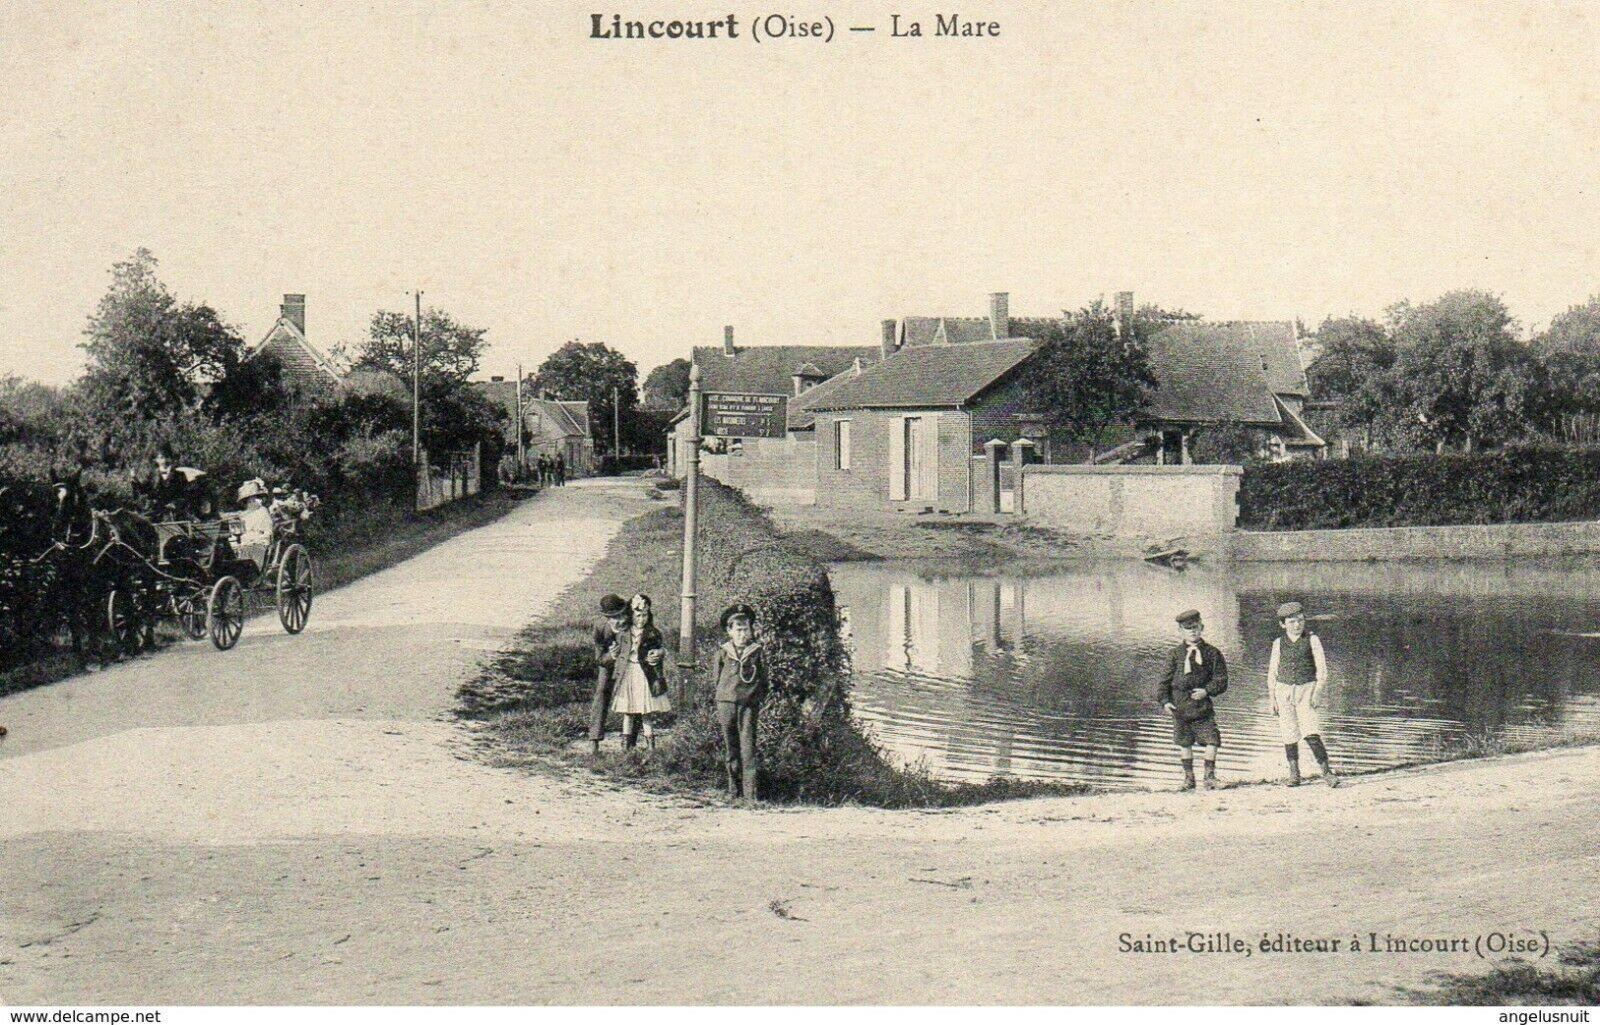 Lincourt